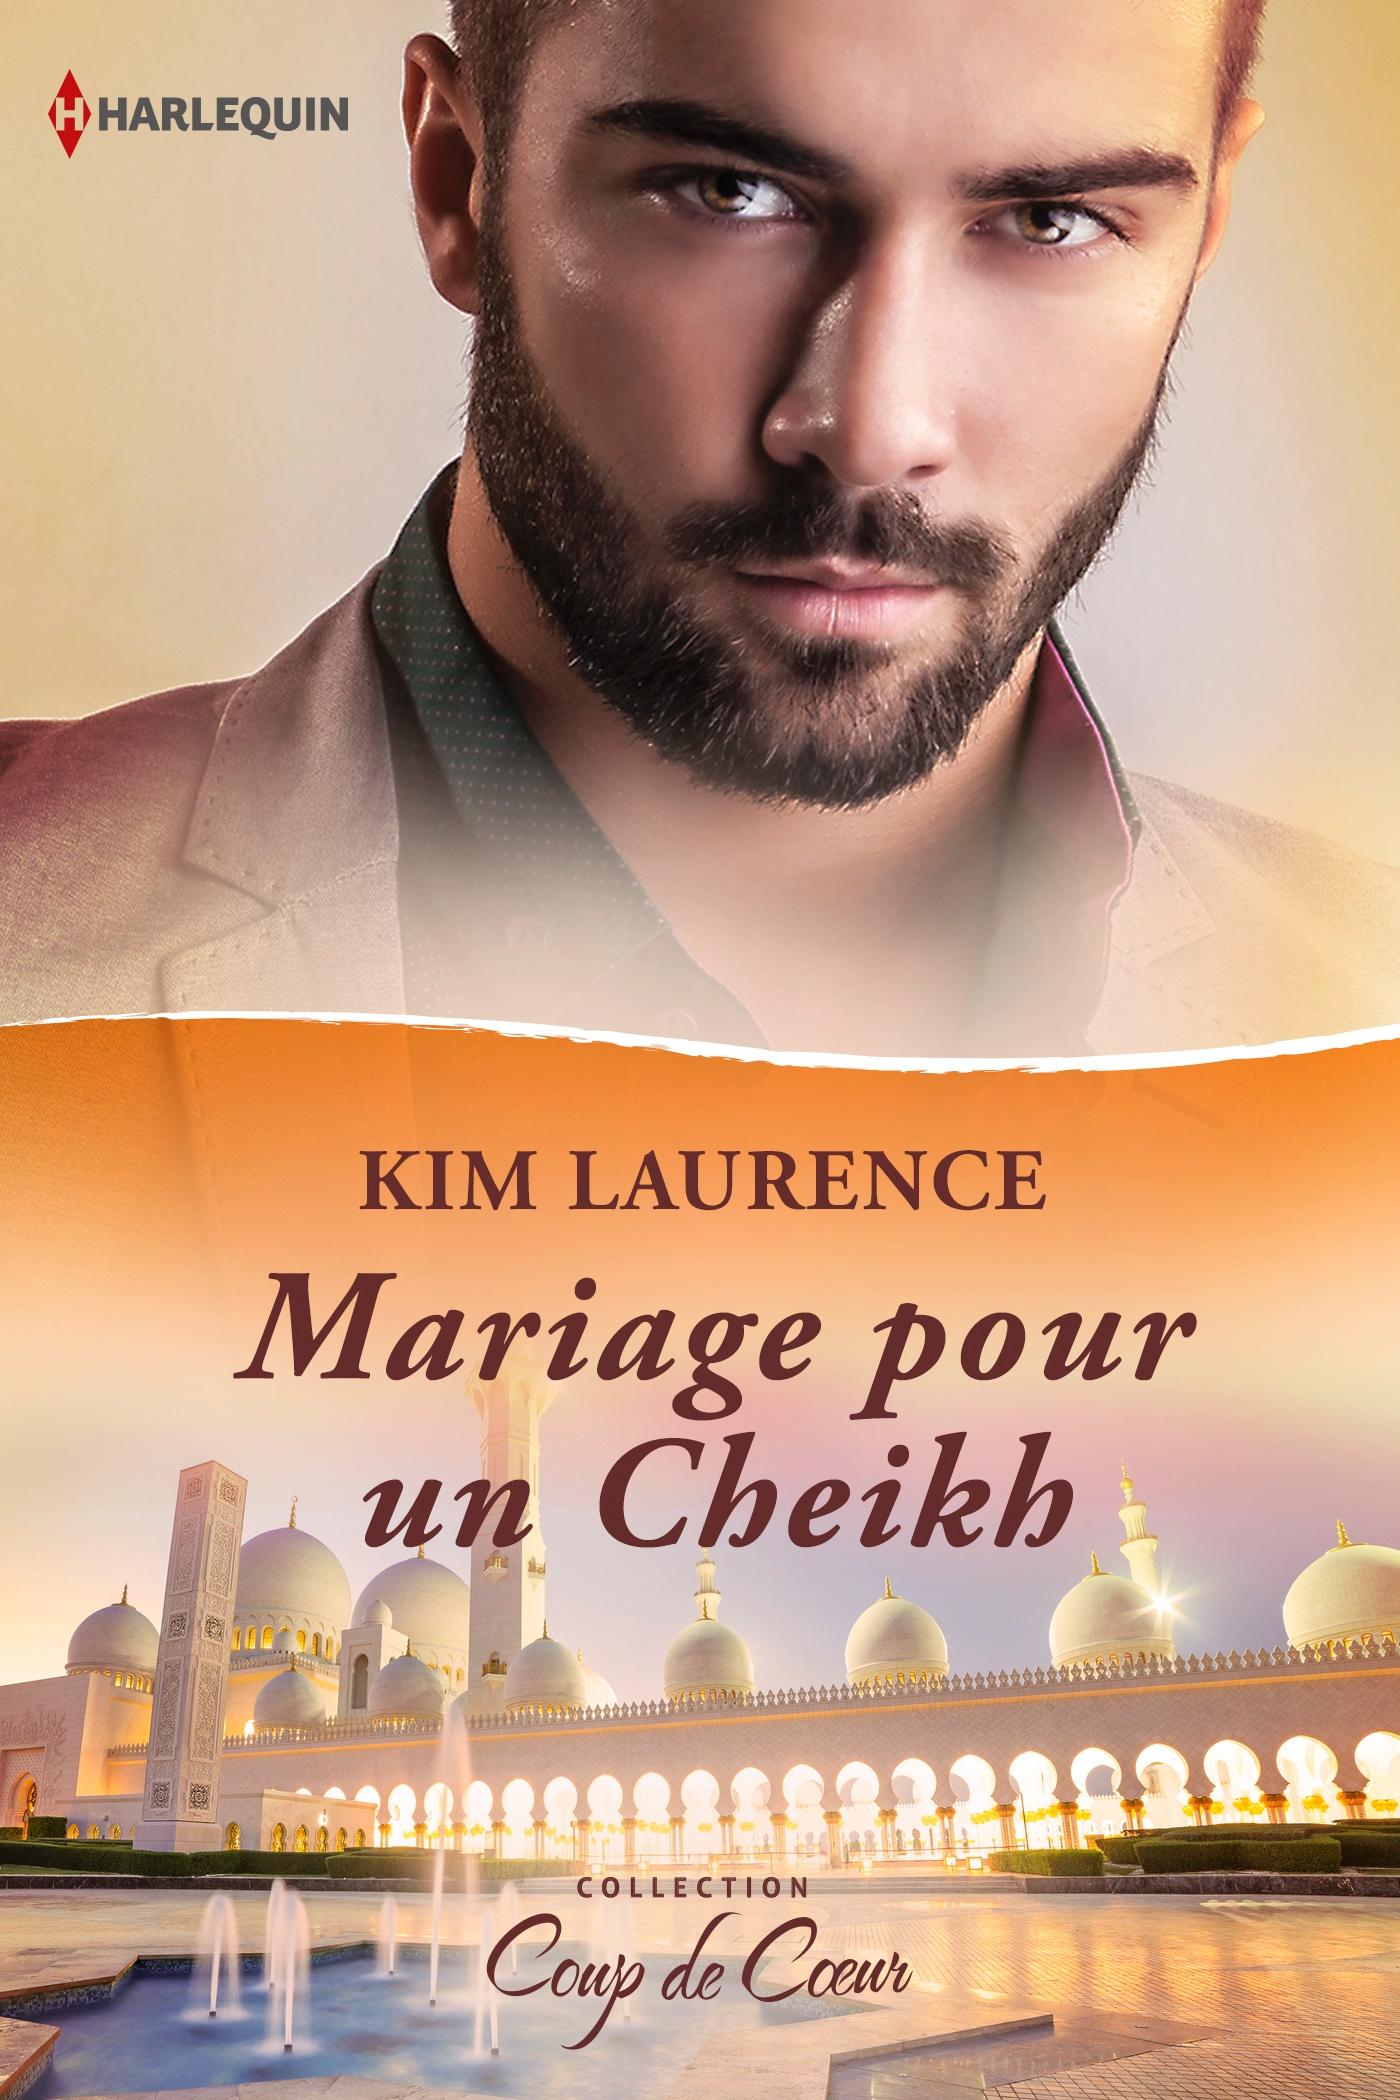 Harlequin mariage pour un cheikh - Coup de coeur nora roberts ...